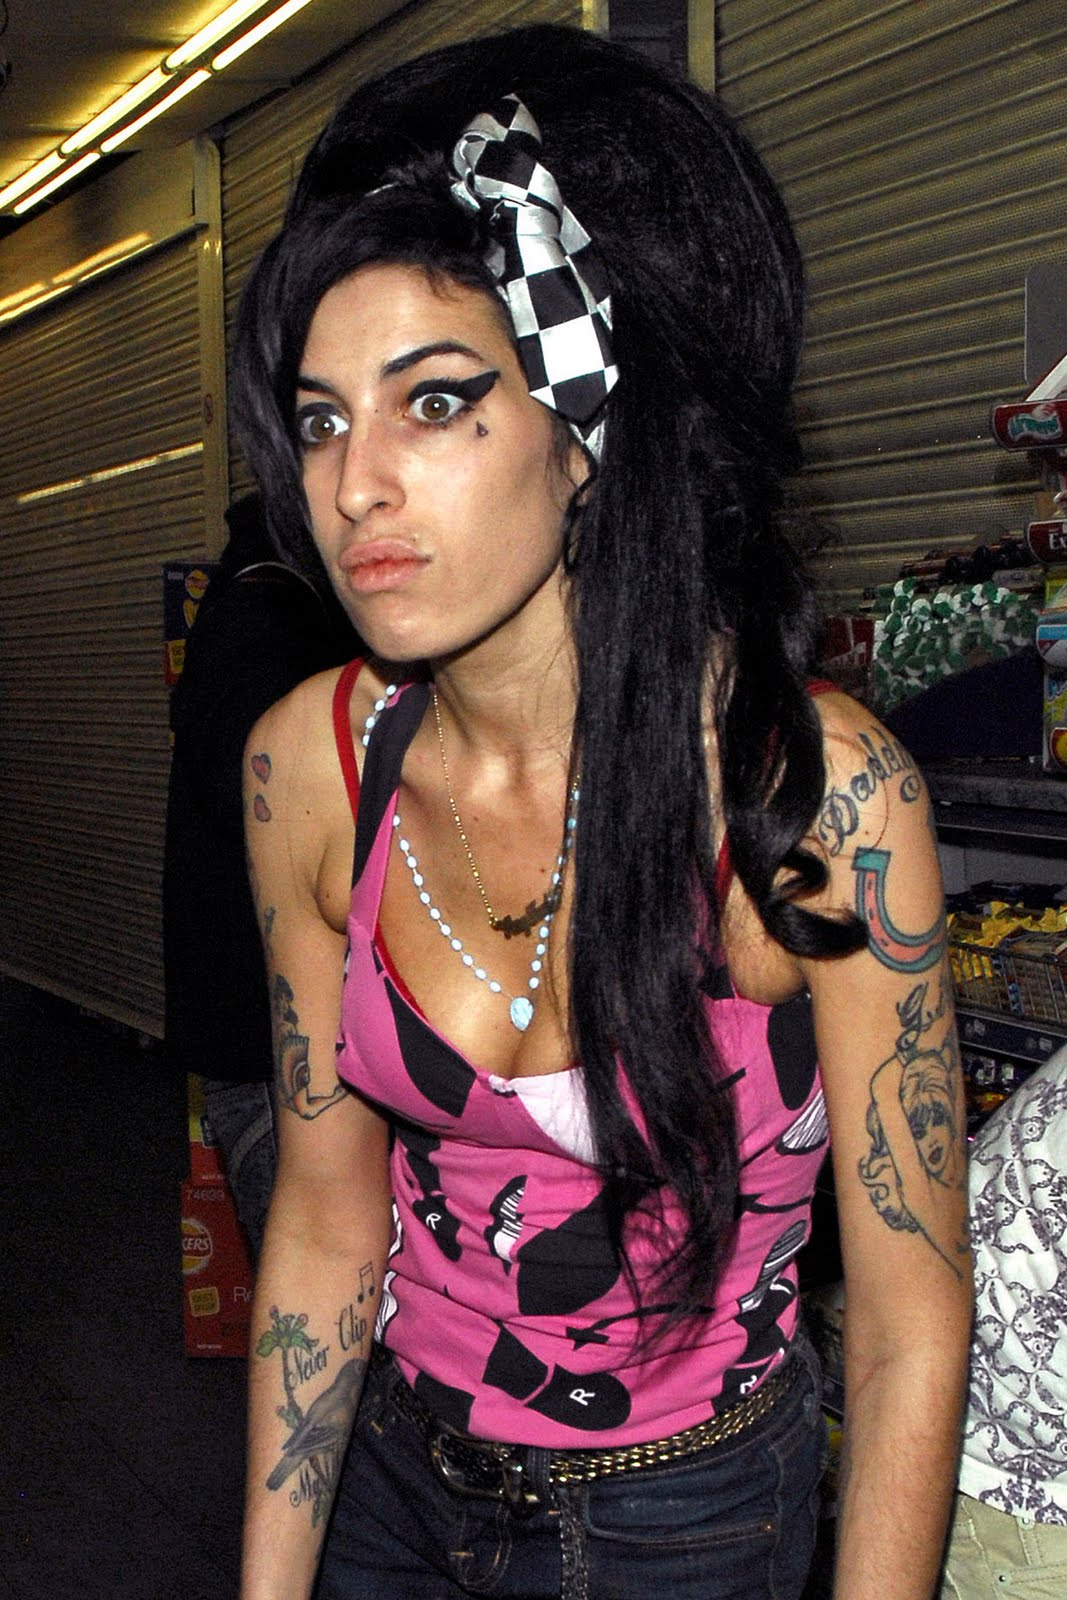 https://3.bp.blogspot.com/_csogD6ptEnI/SwD5iAHcA6I/AAAAAAAADhc/Bqx4S0Ov79A/s1600/Amy_Winehouse_03.jpg